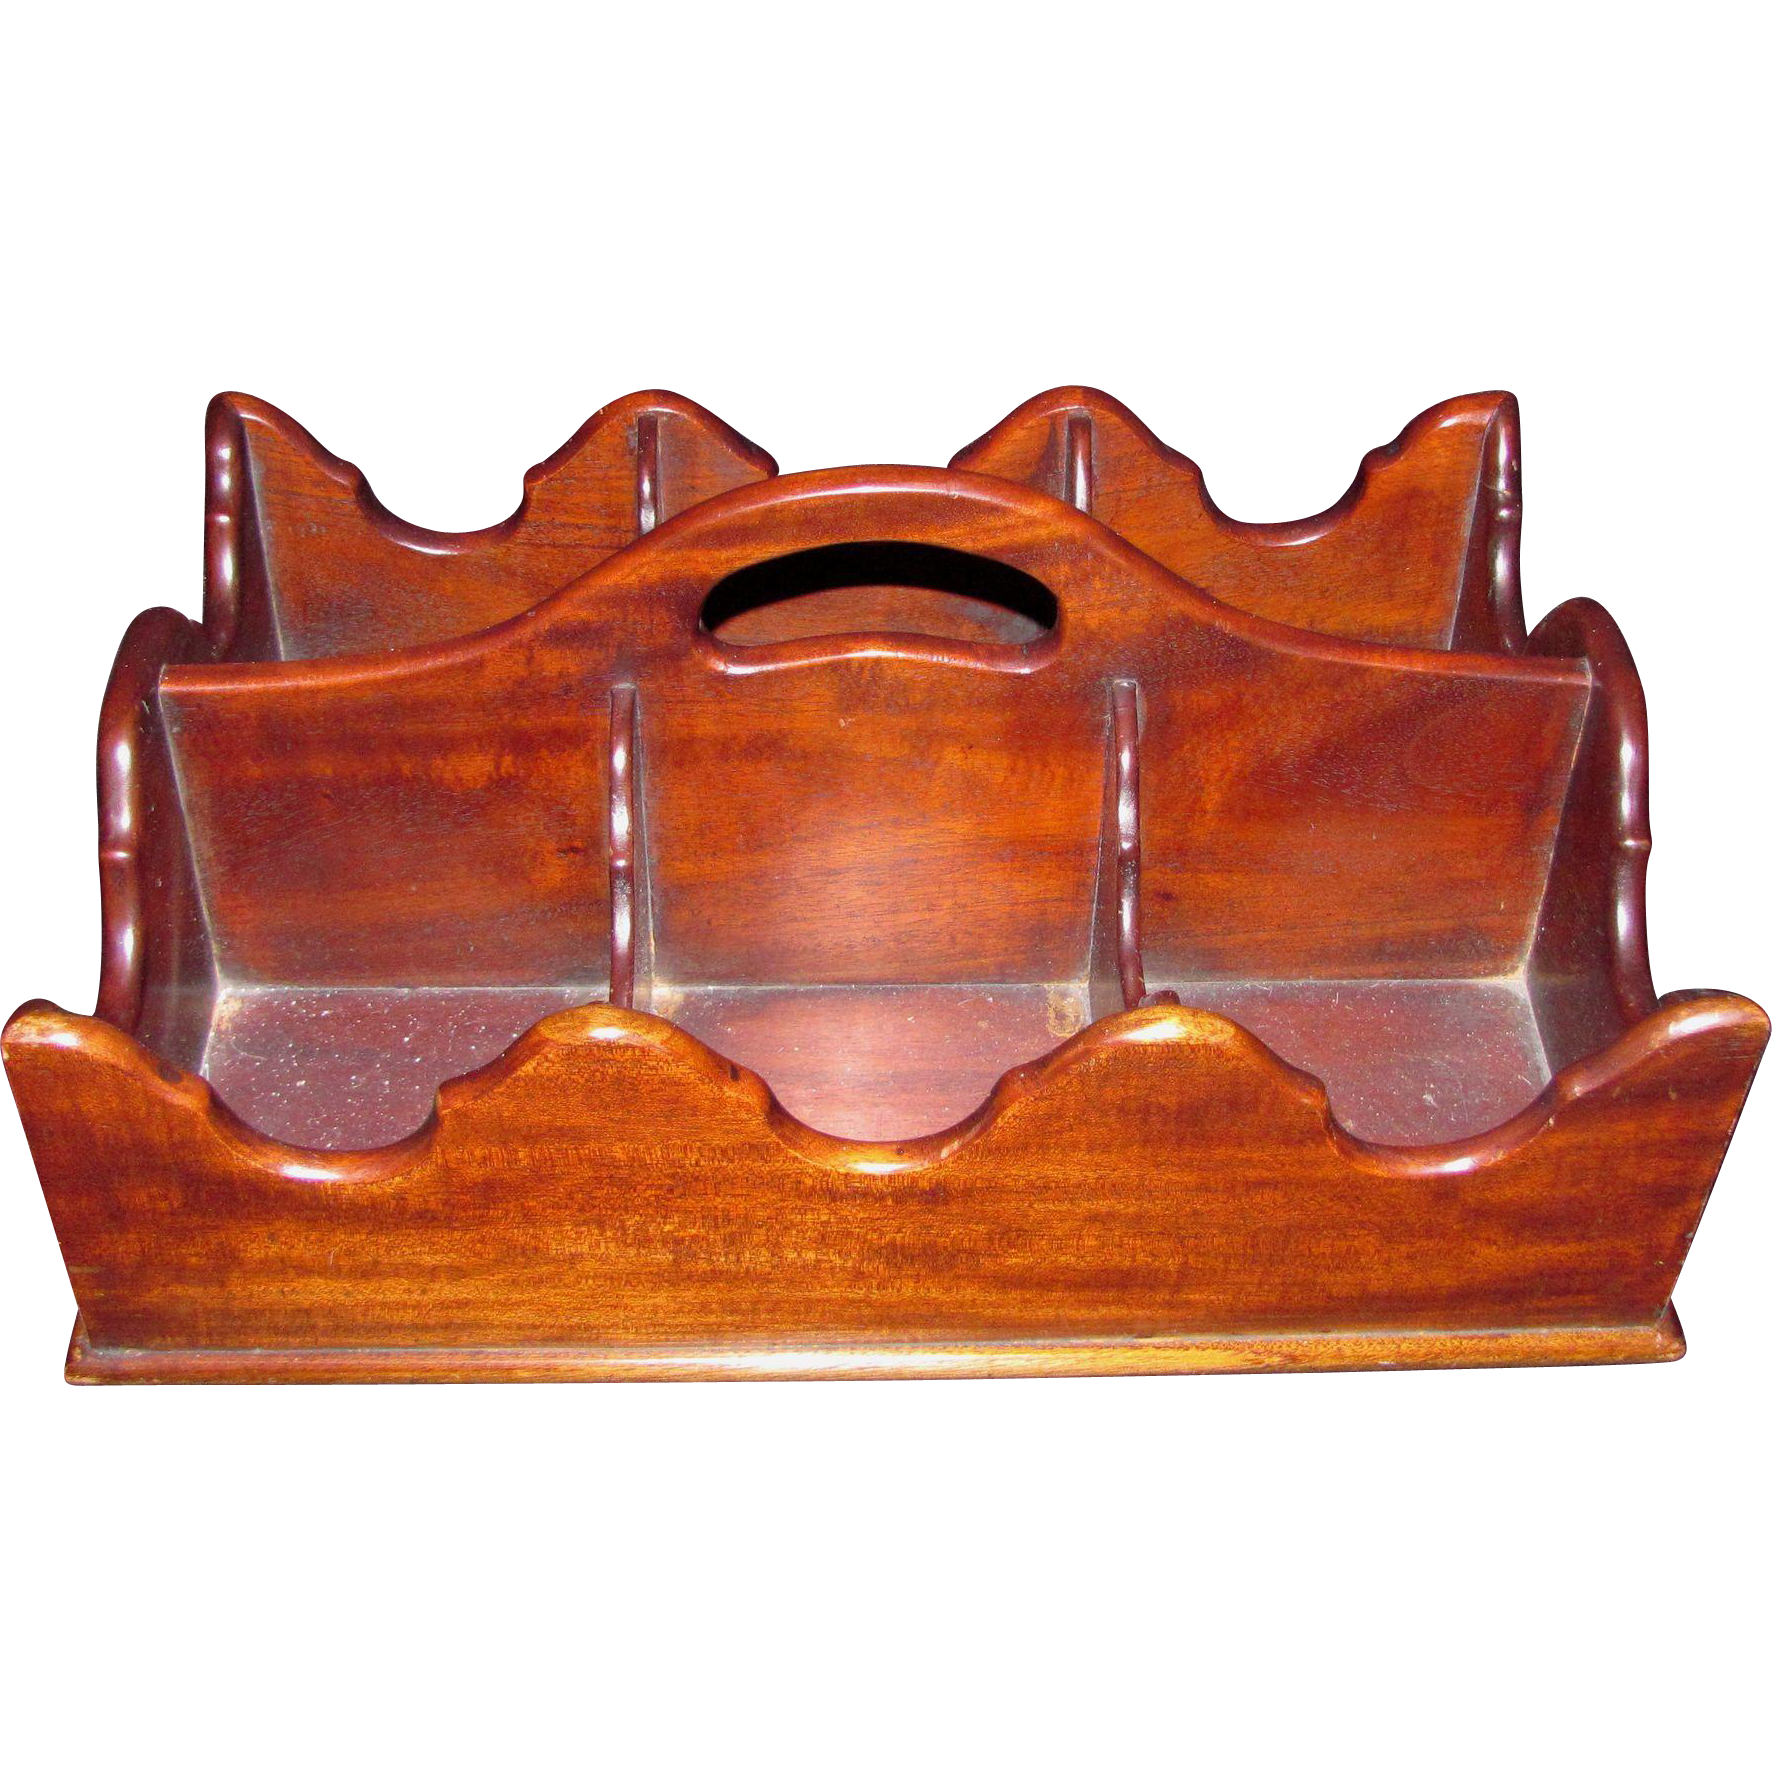 Antique American Mahogany Bottle Caddy Circa 1800